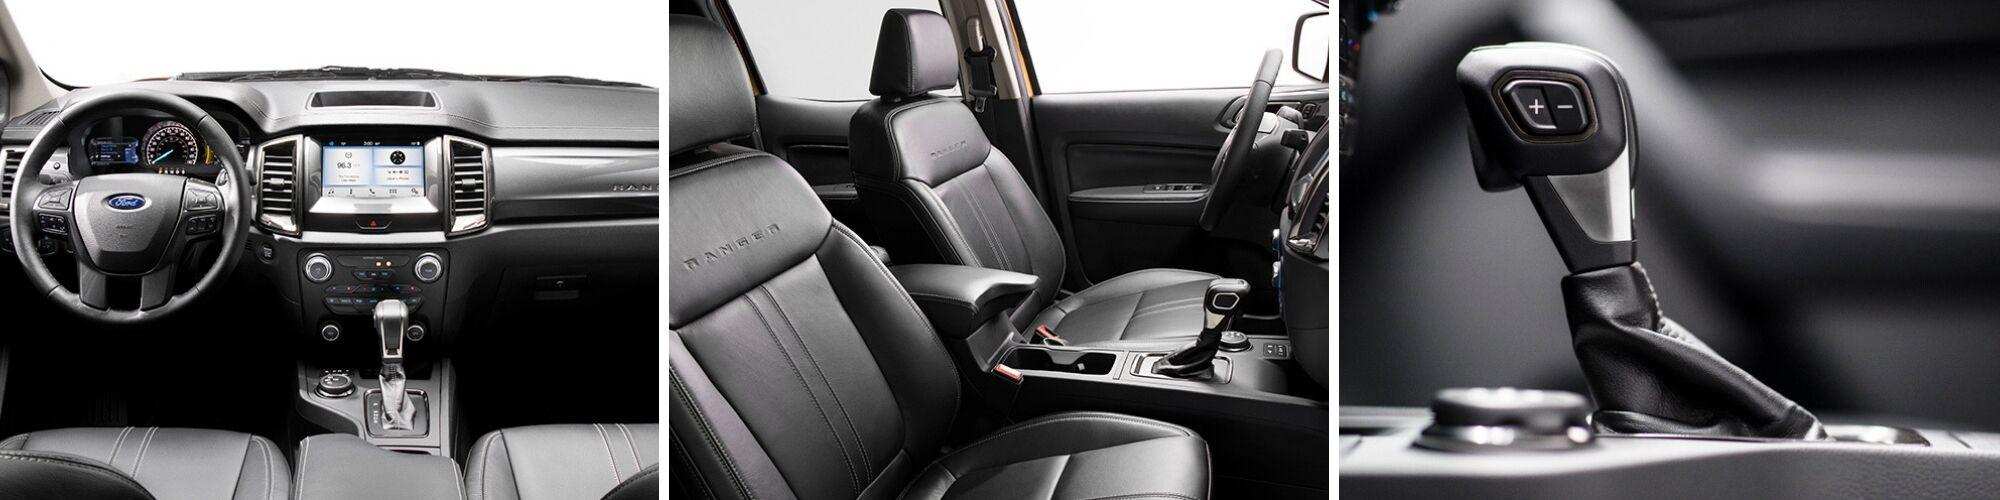 2019 ford ranger interior view